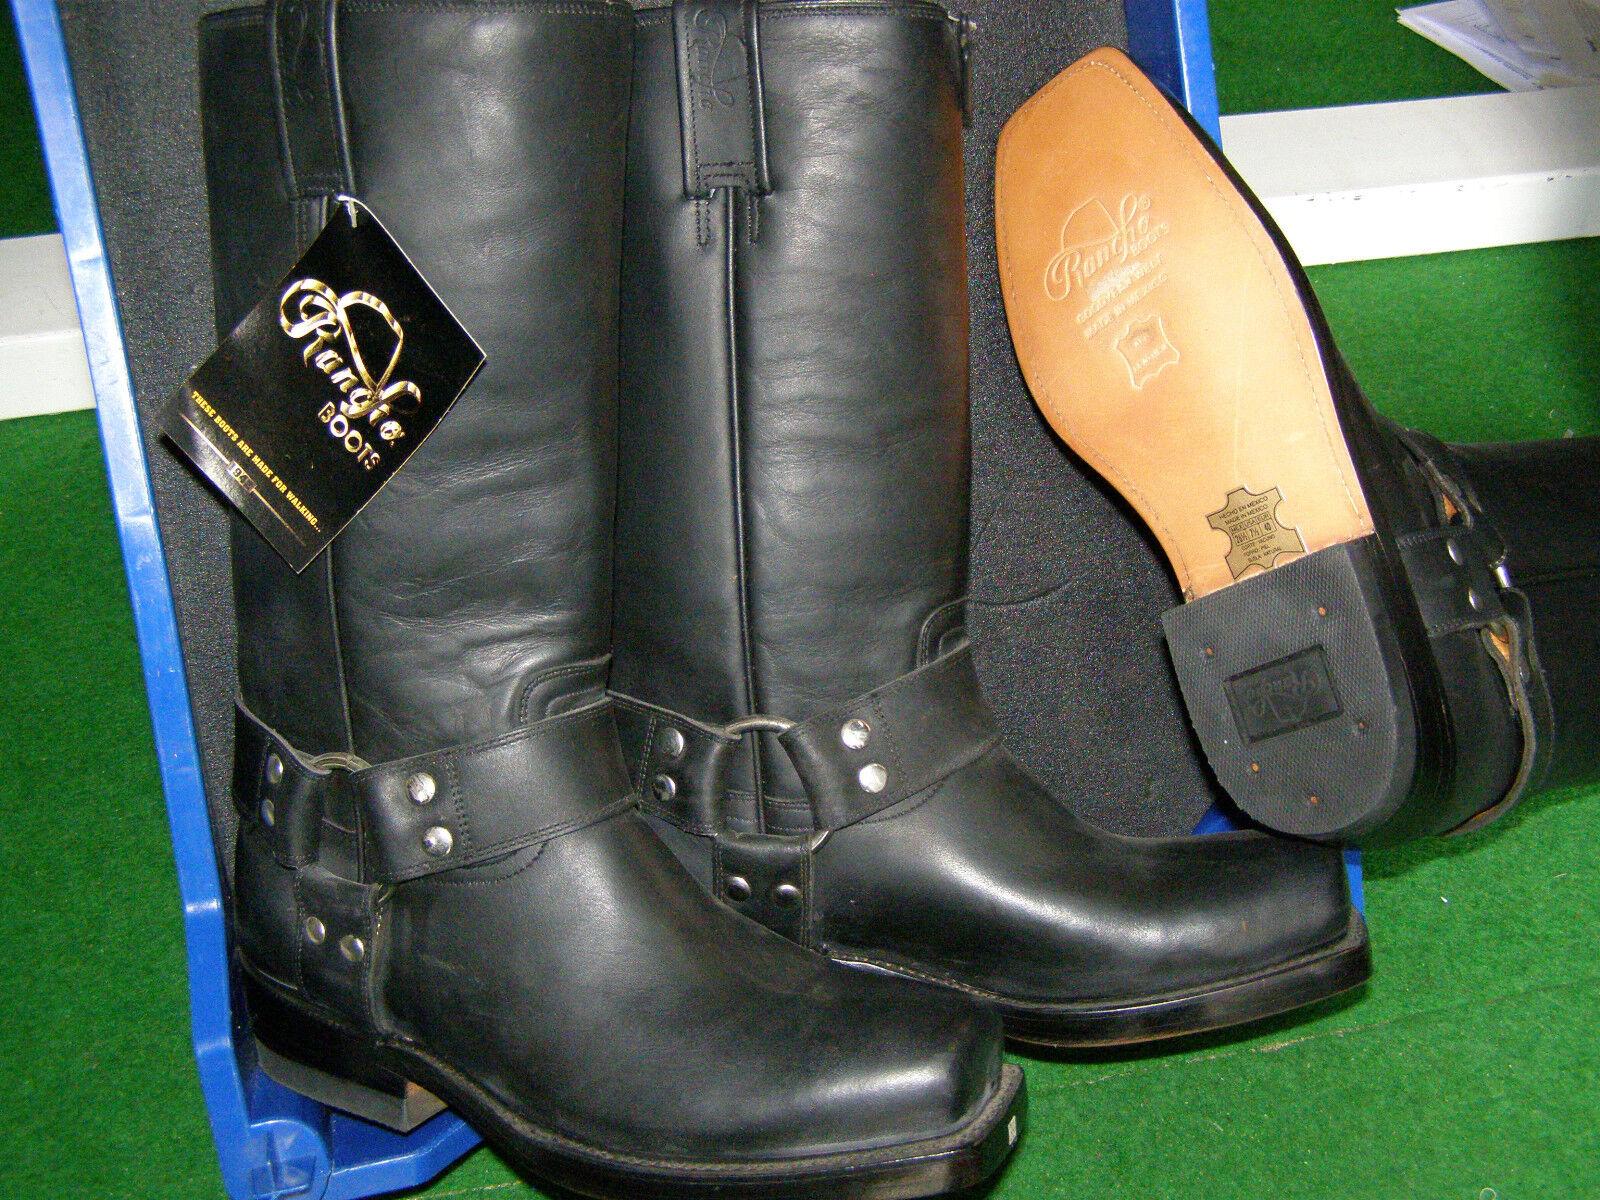 Bikerboots Westernstiefel Boots, Cowboystiefel   Rancho Boots, Westernstiefel EINZELSTÜCKE fecc8a